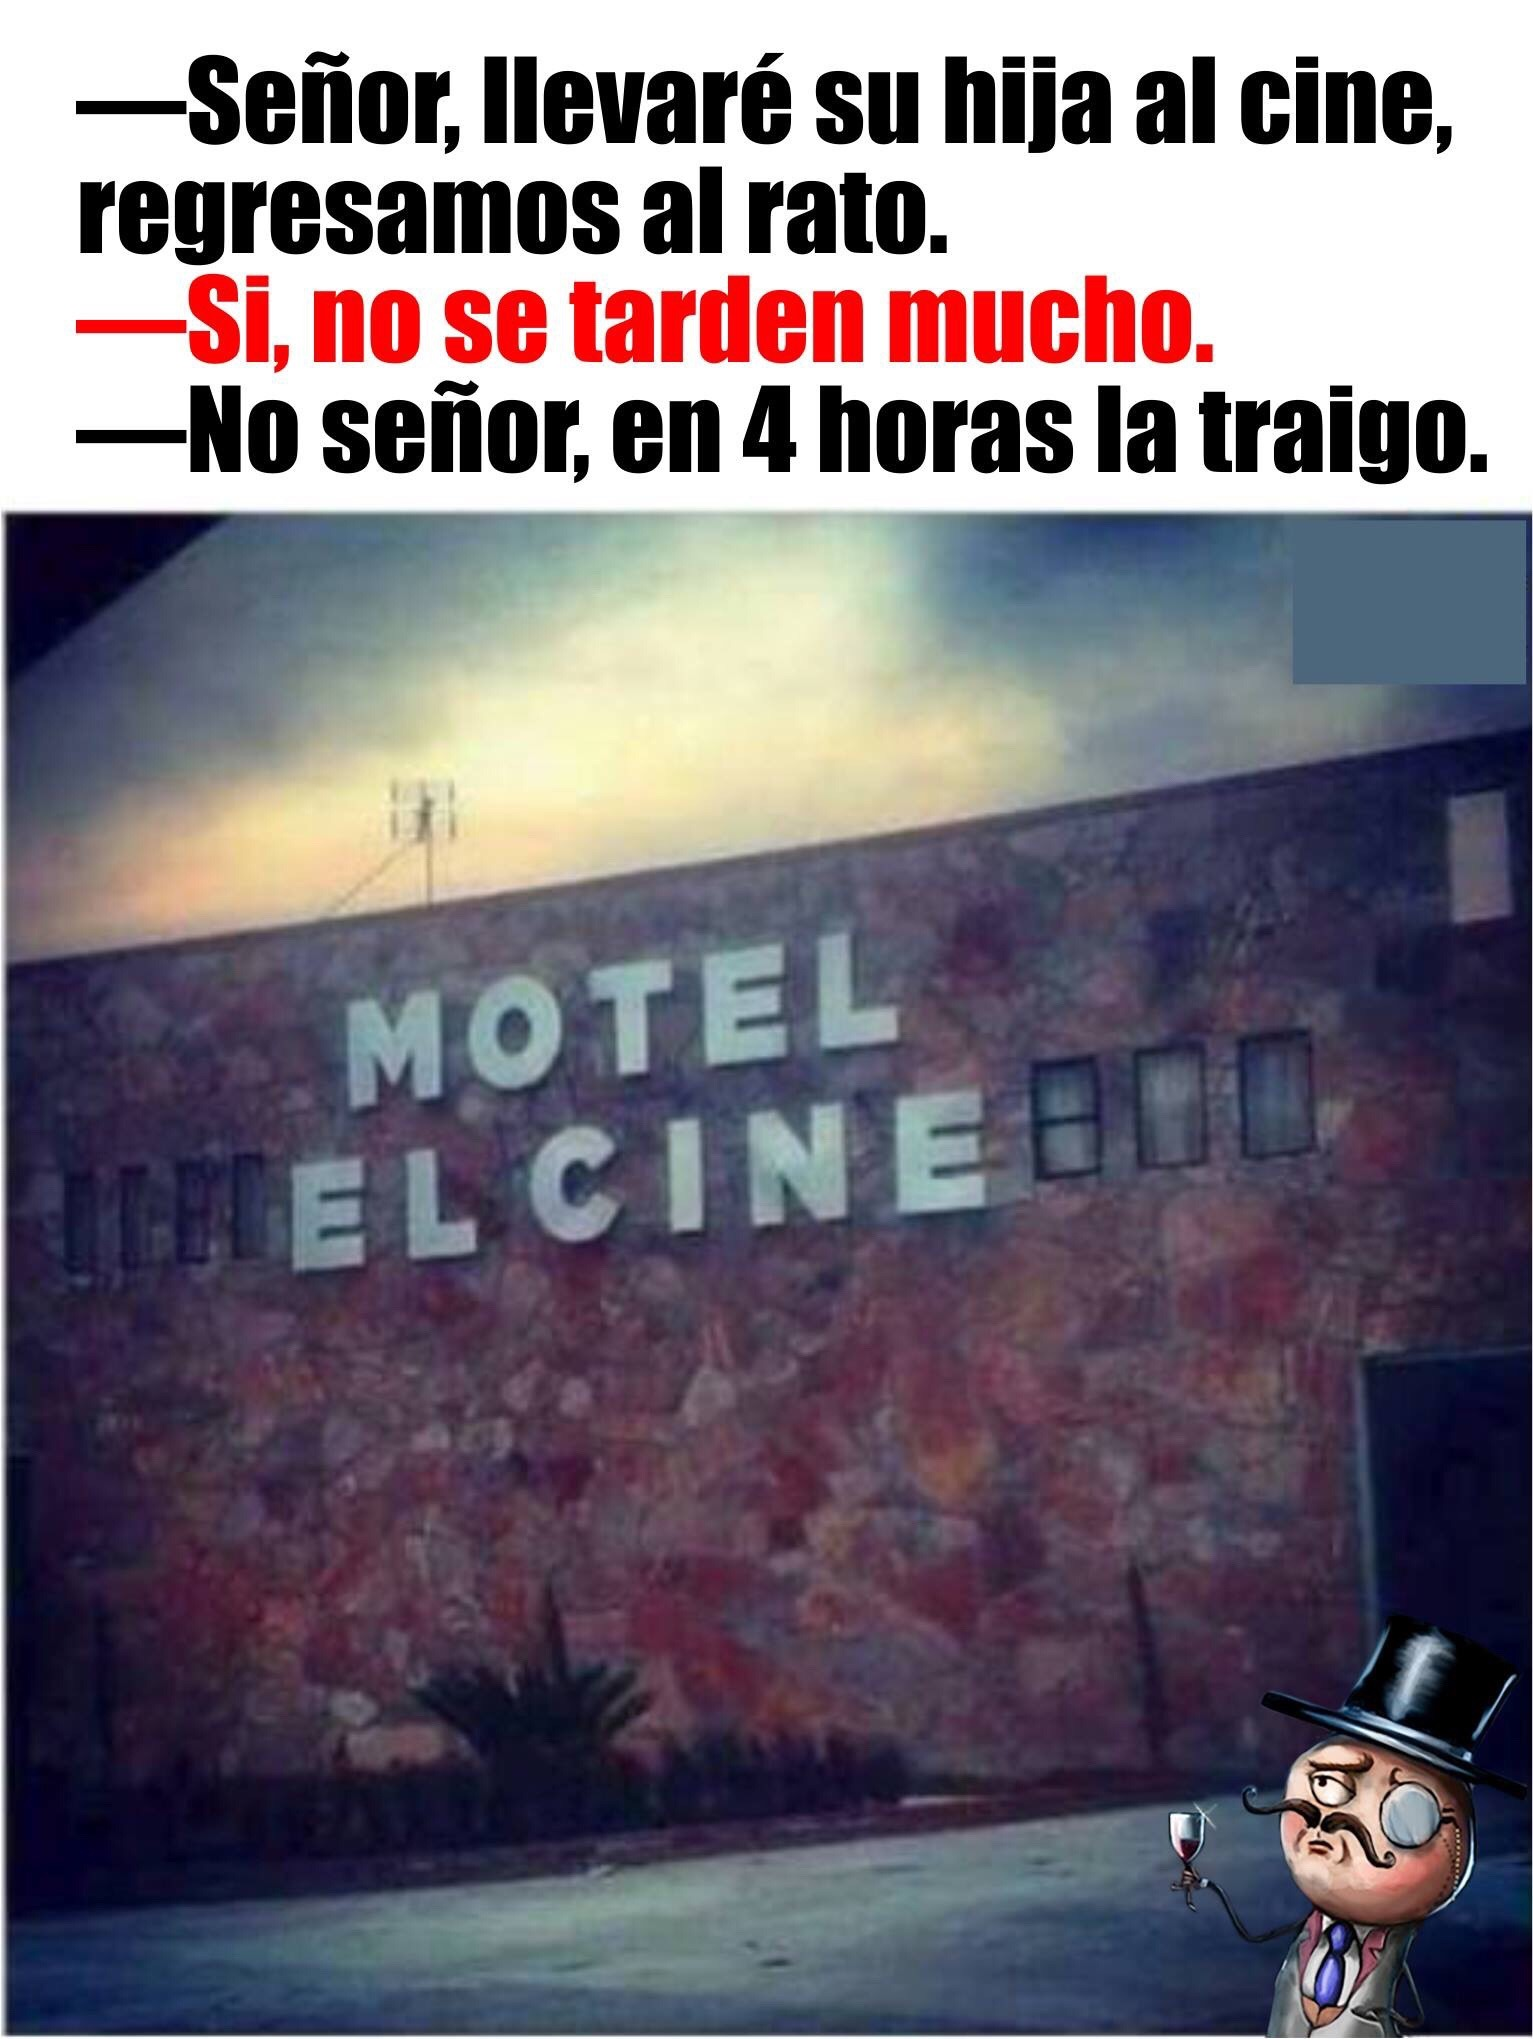 Al cine - meme